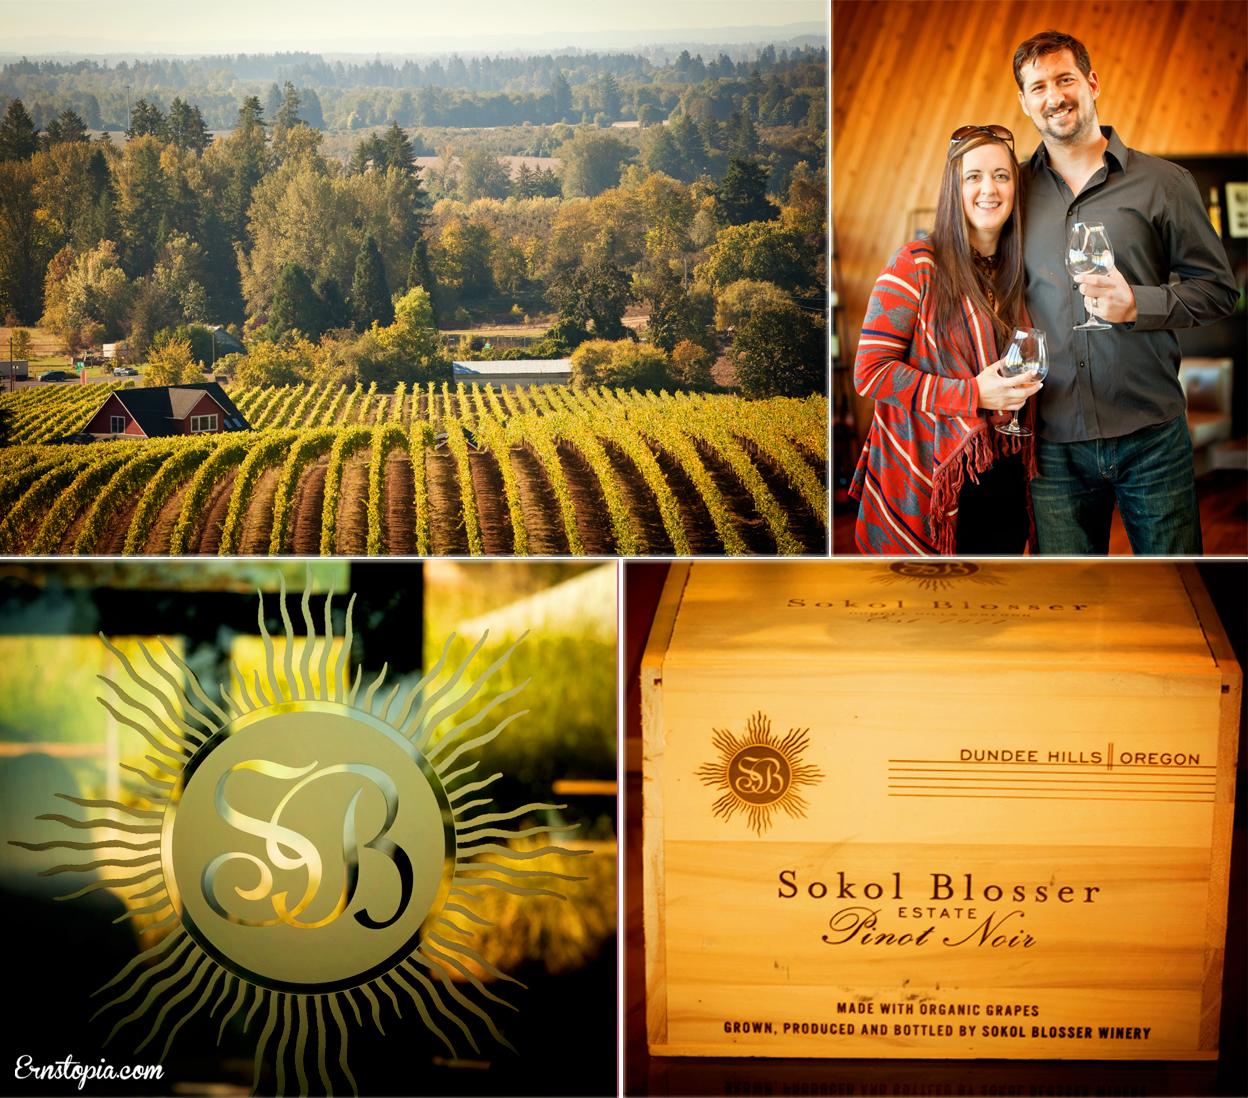 Sokol Blosser Wine Tour